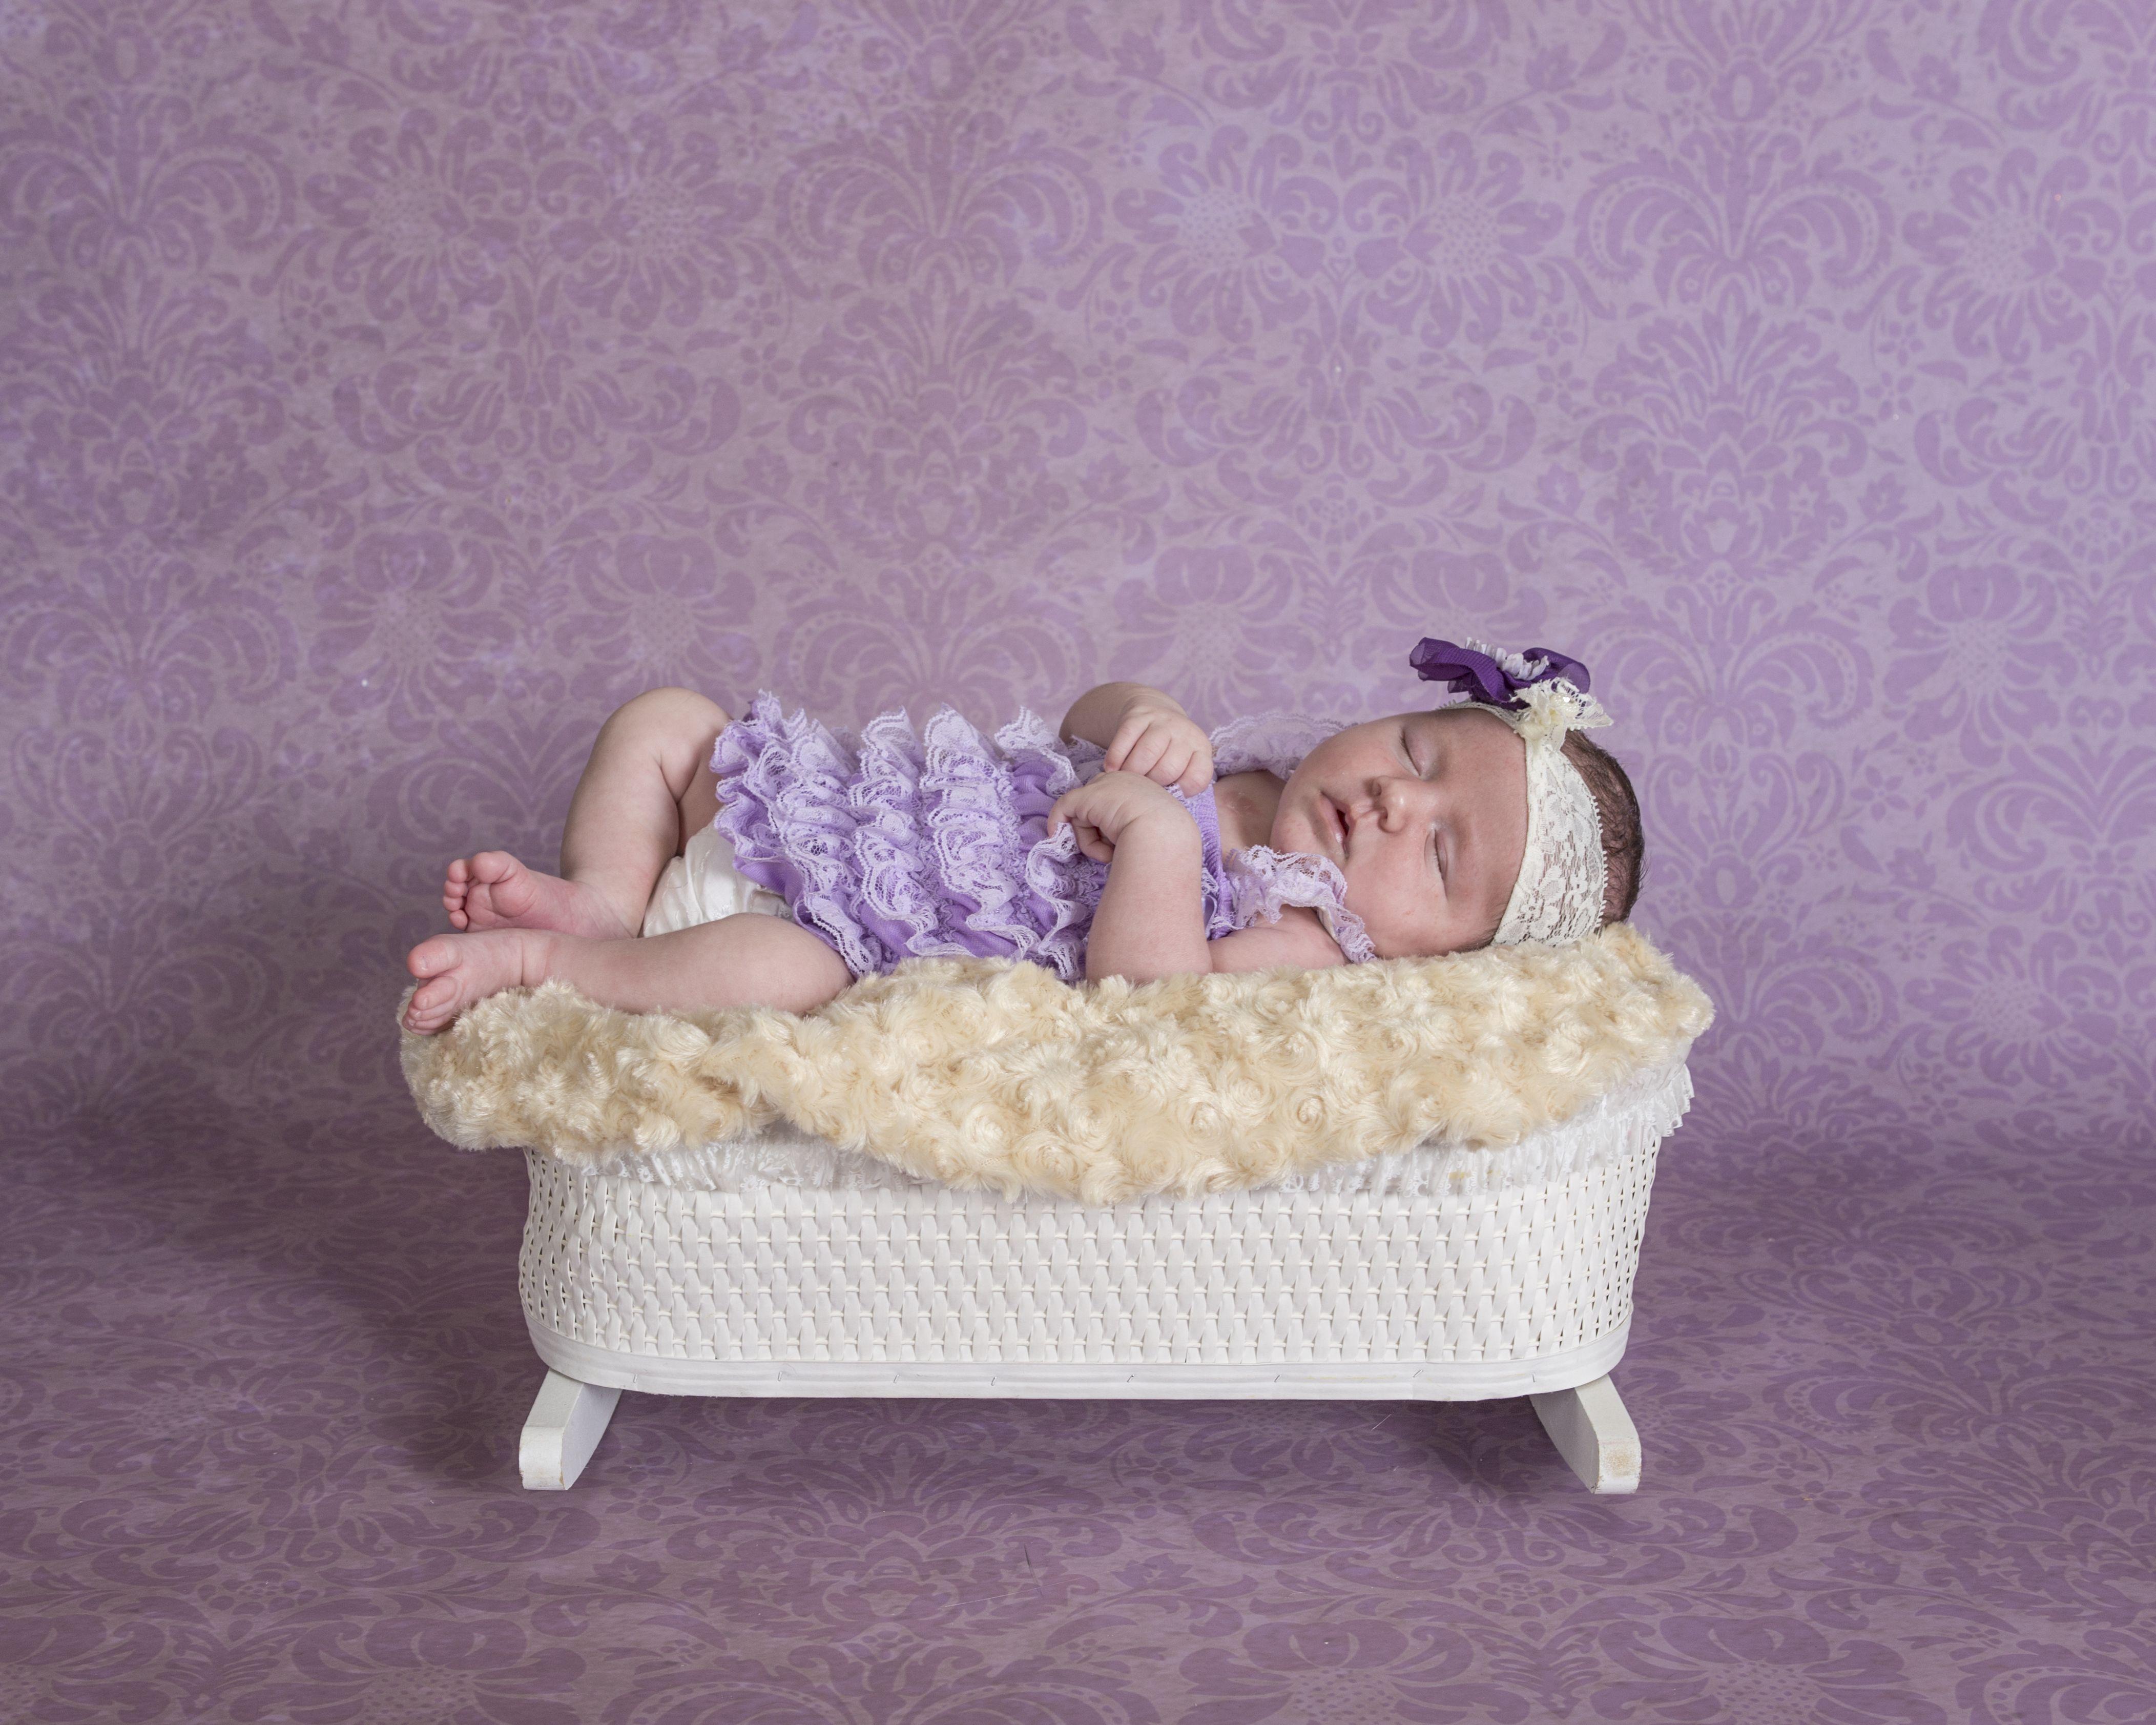 newborn girl in purple lace romper in vintage crib